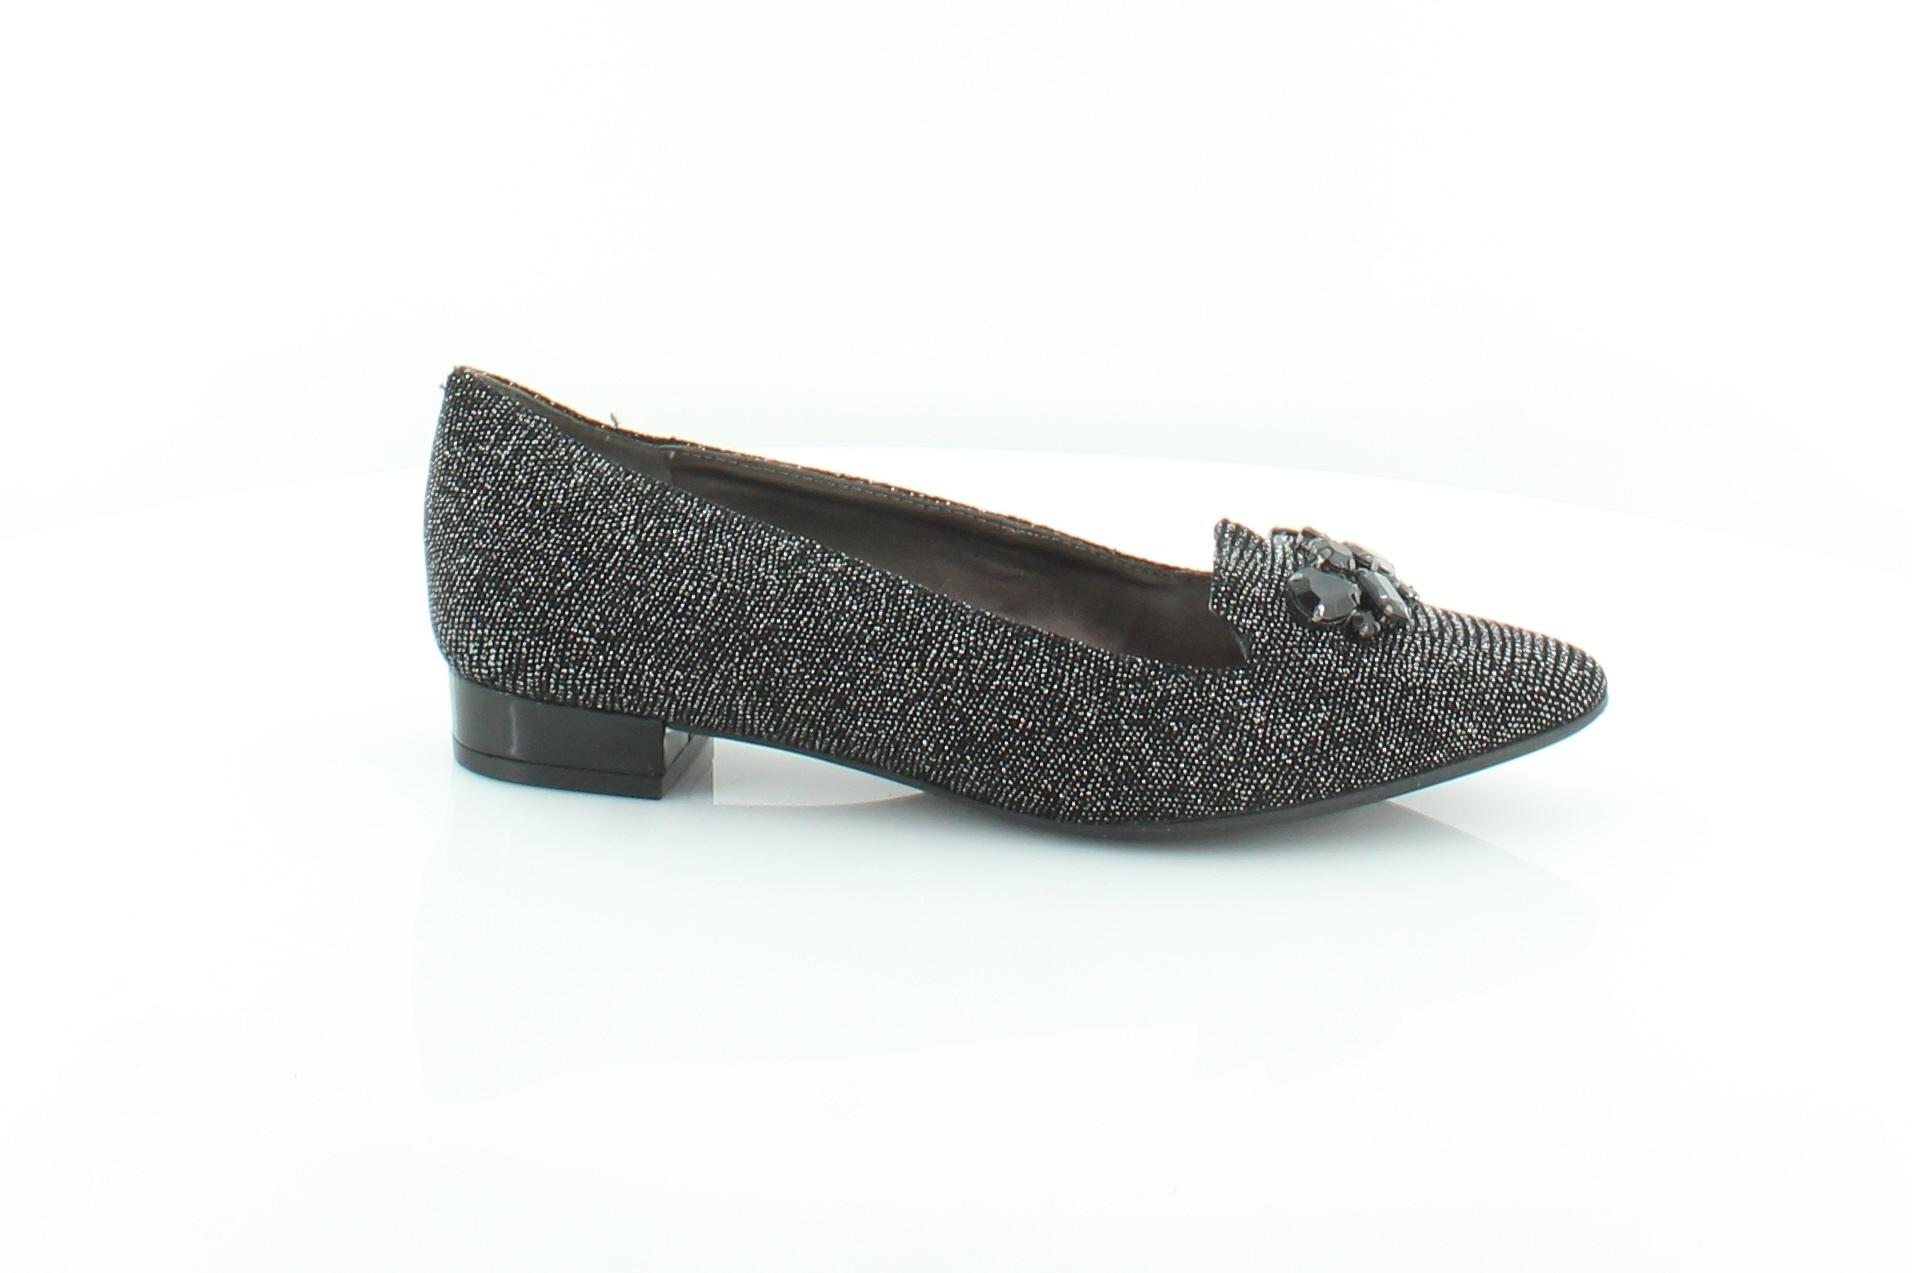 ef102c0a4c7 Anne Klein Kamy Black Womens Shoes Size 6 M Flats MSRP  85 ...